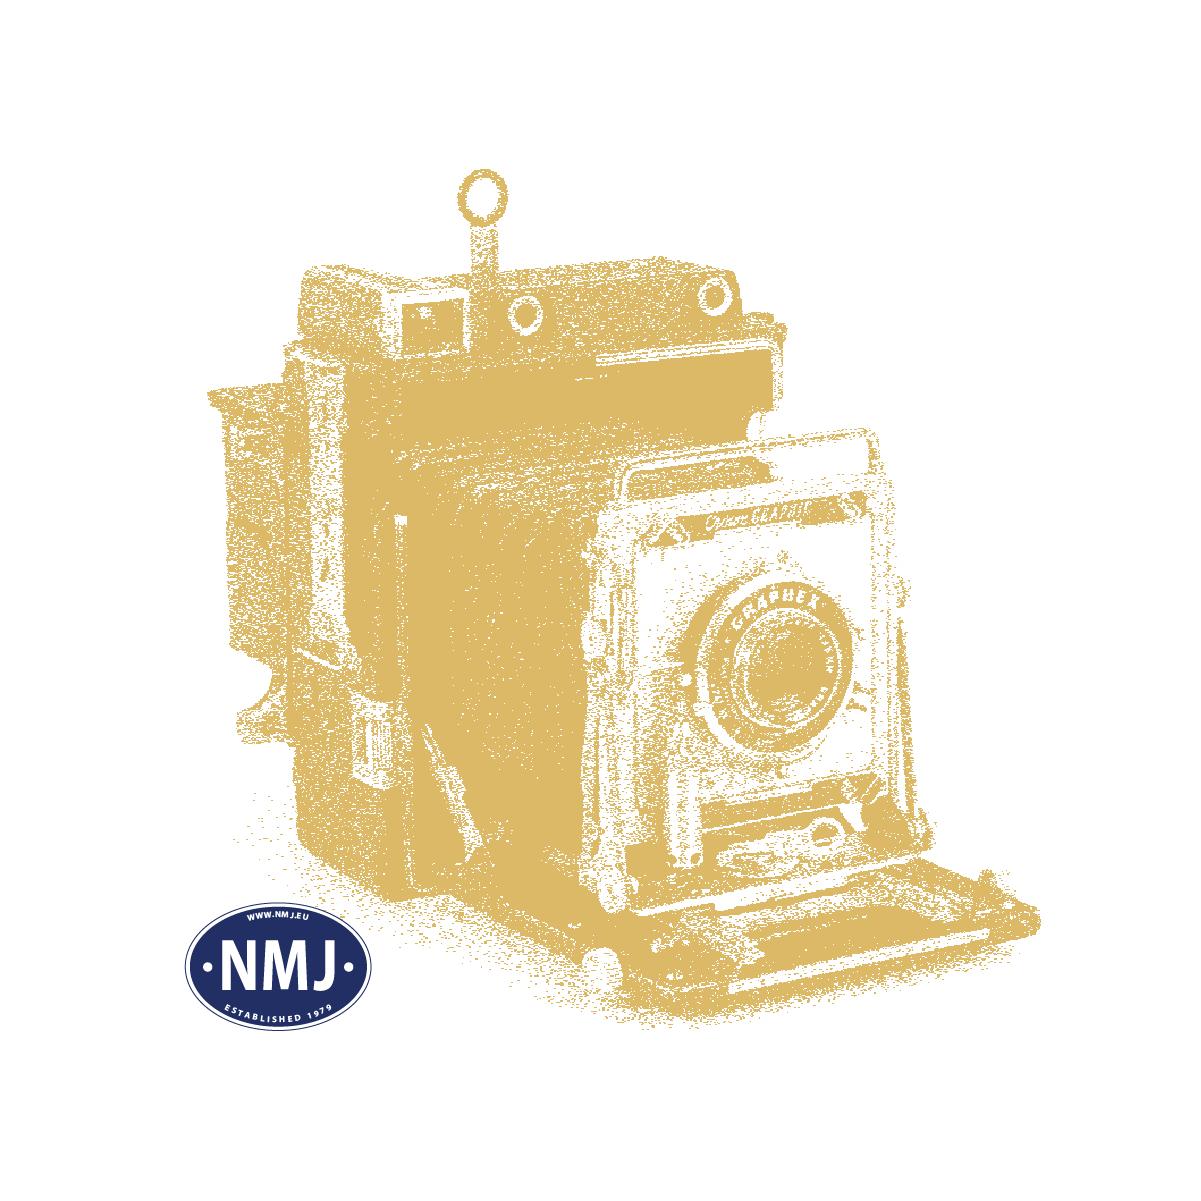 NMJT83.312 - NMJ Topline CargoNet Skd 224.218, Rot/gelb, DCC Digital H0